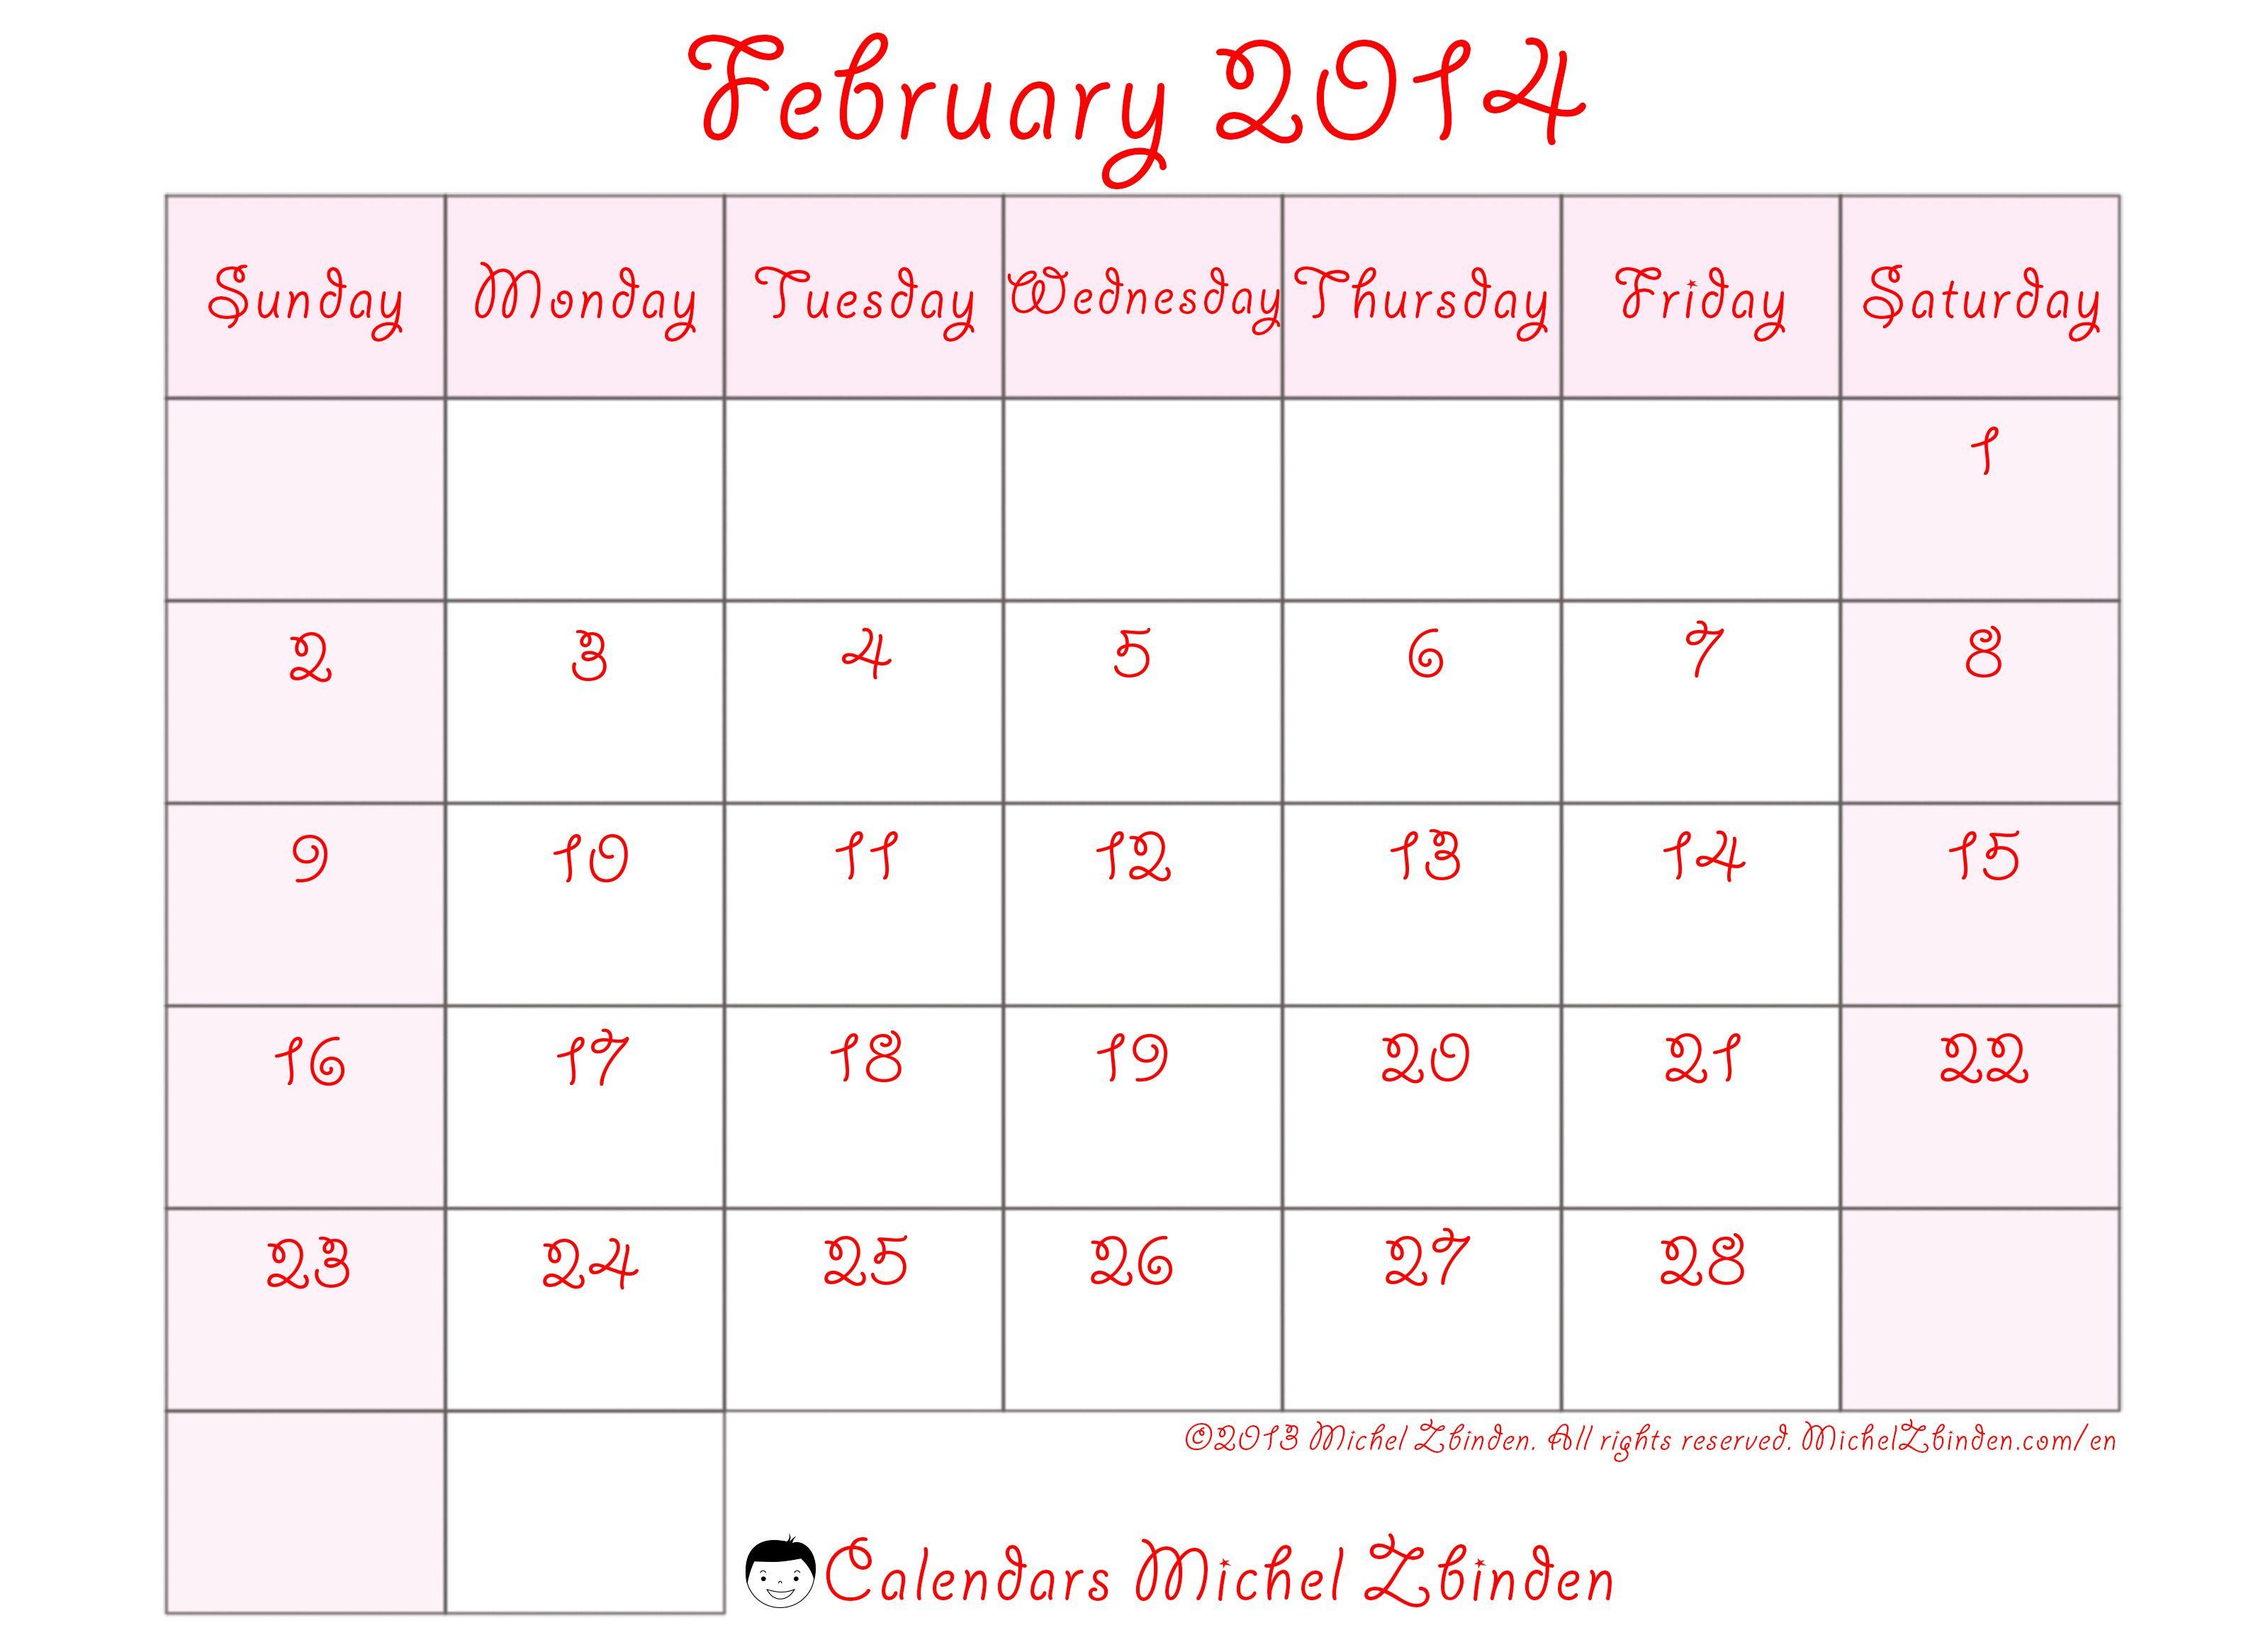 February 2014 Calendar Printable